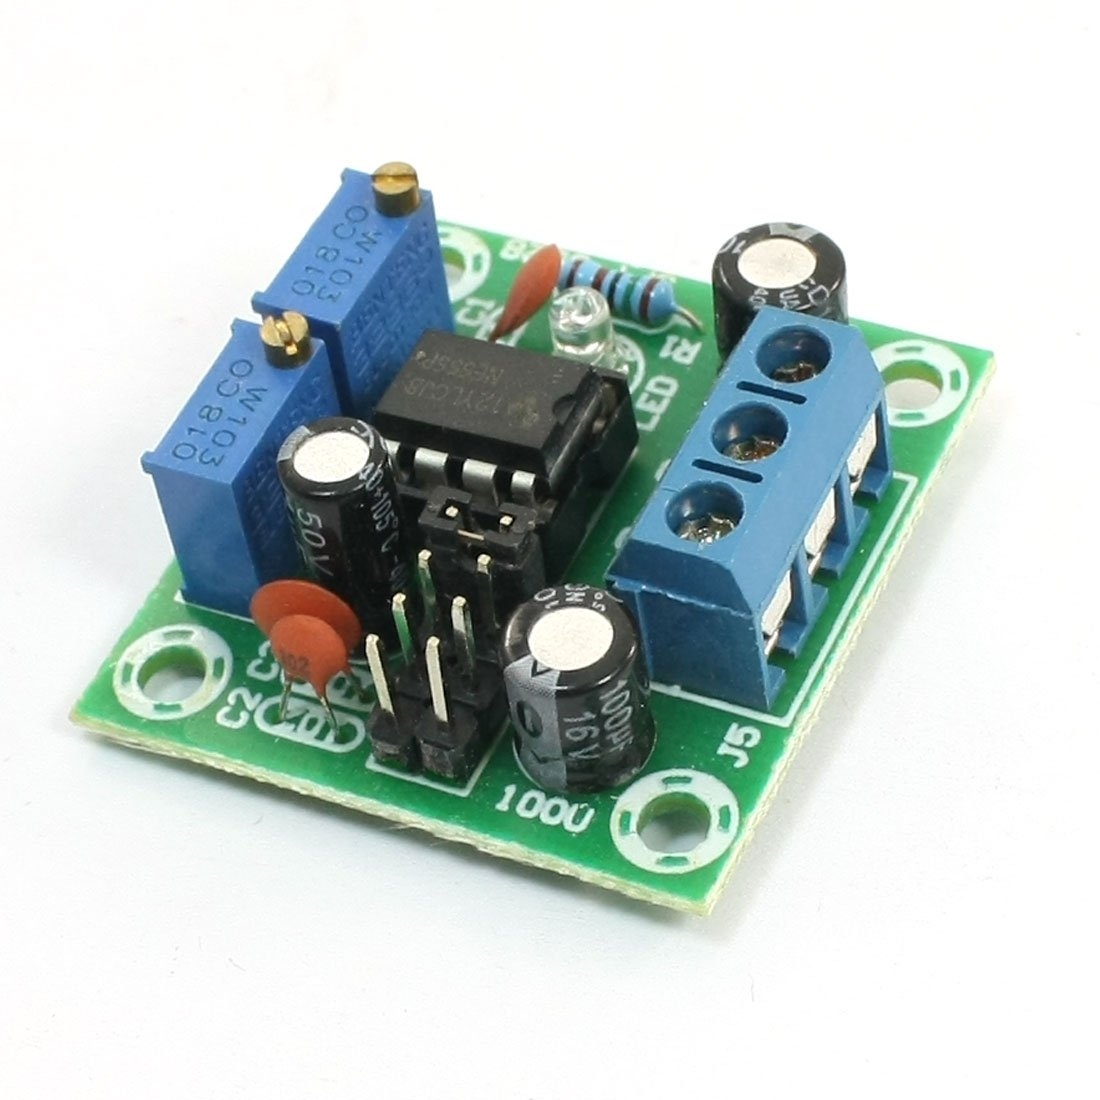 Uxcell a13100900ux0307 Square Wave Signal Generator NE555 Pulse Module w LED Indicator 5-15V